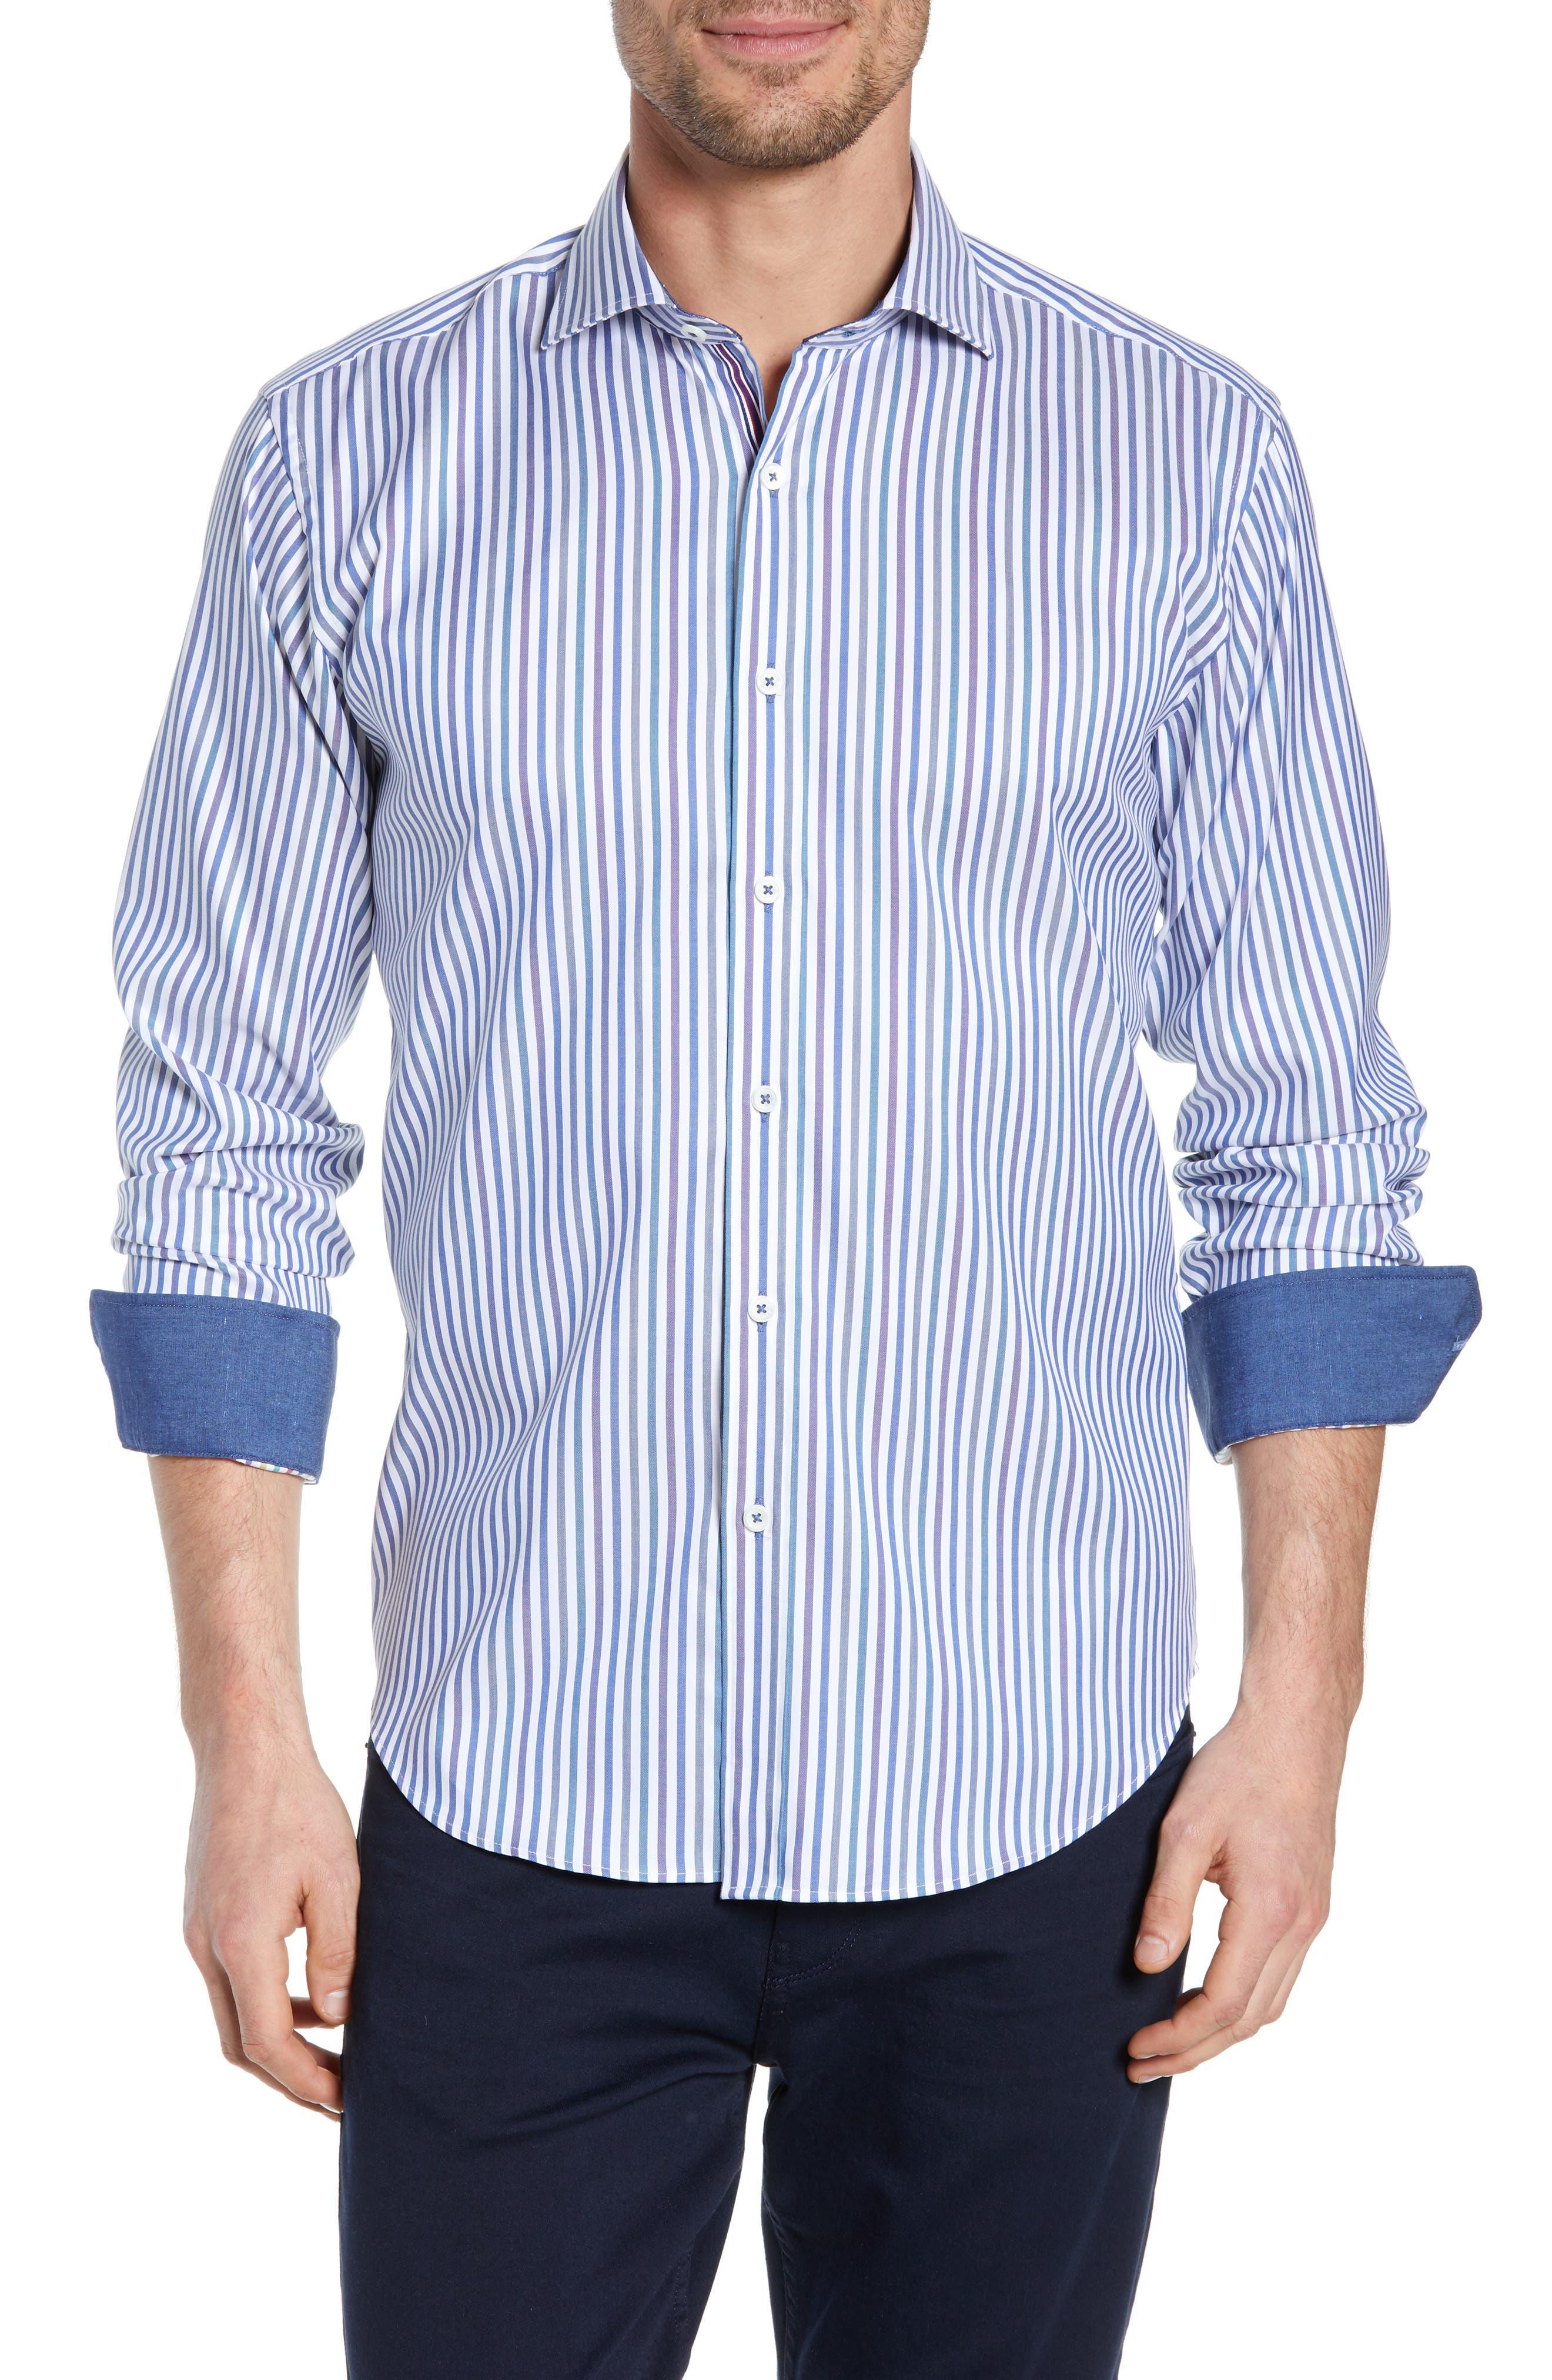 BUGATCHI, Classic Fit Stripe Sport Shirt, Main thumbnail 1, color, CHALK